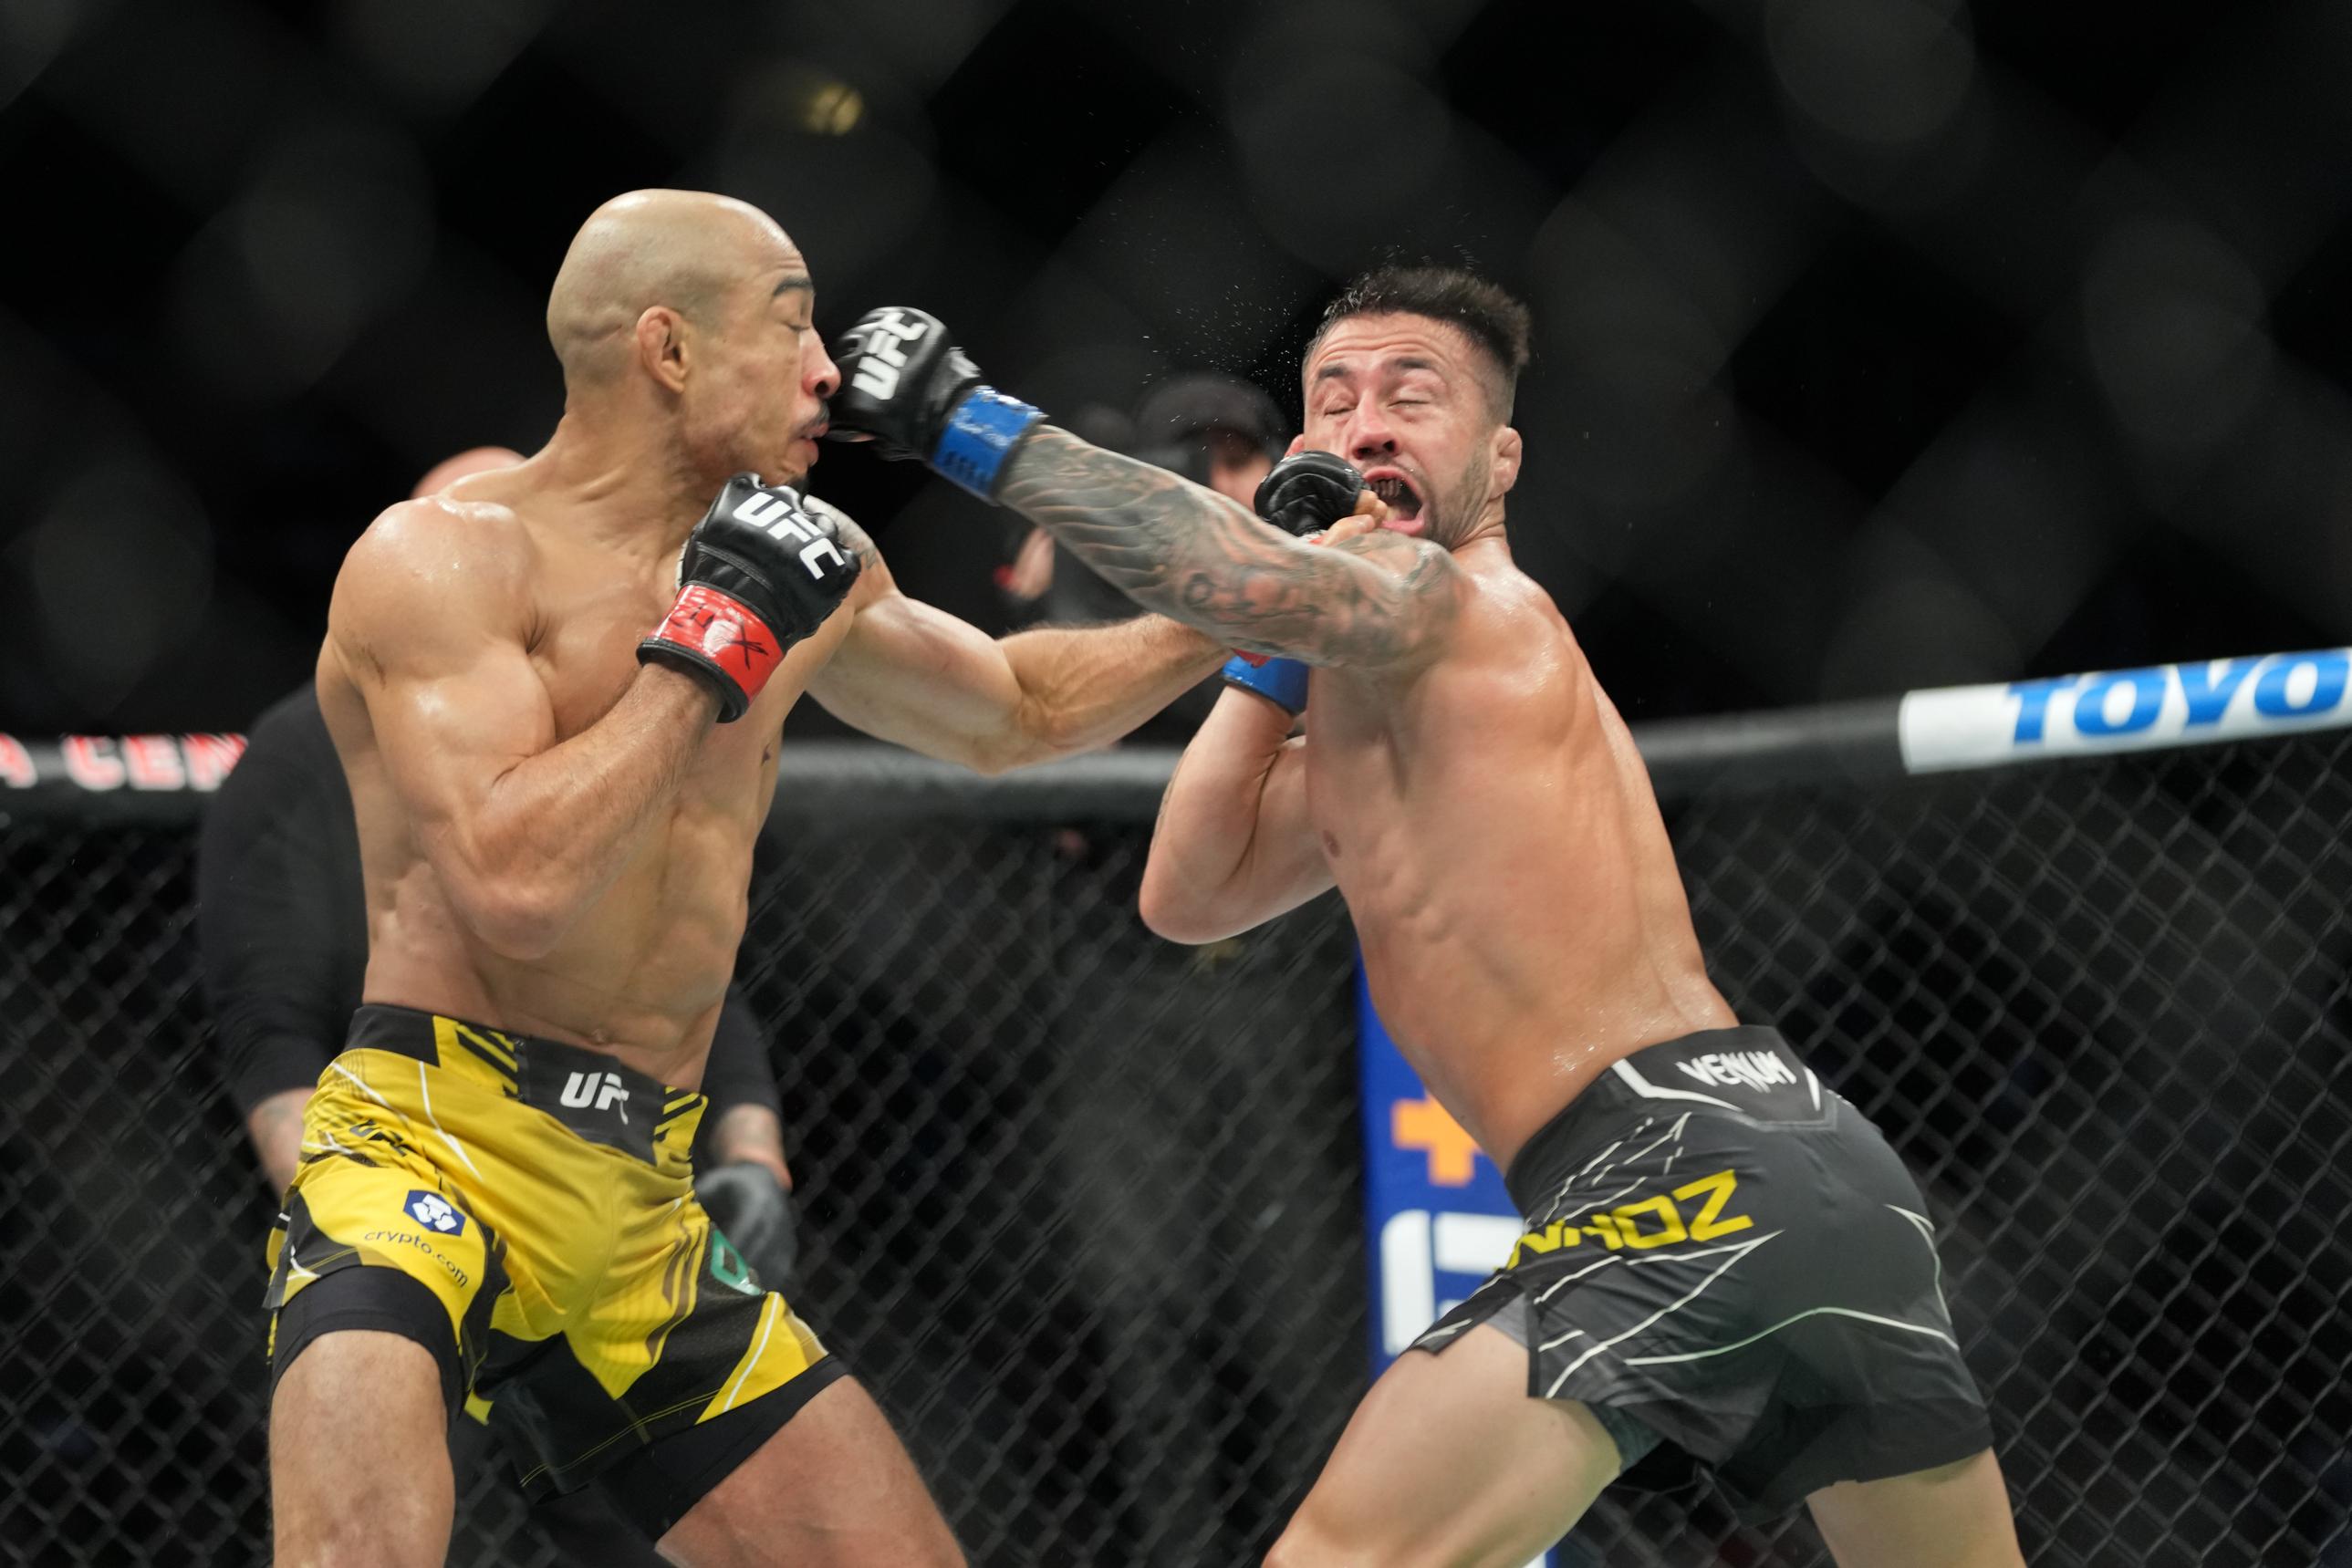 Jose Aldo lands a left hook on Pedro Munhoz at UFC 265 in Houston, TX.